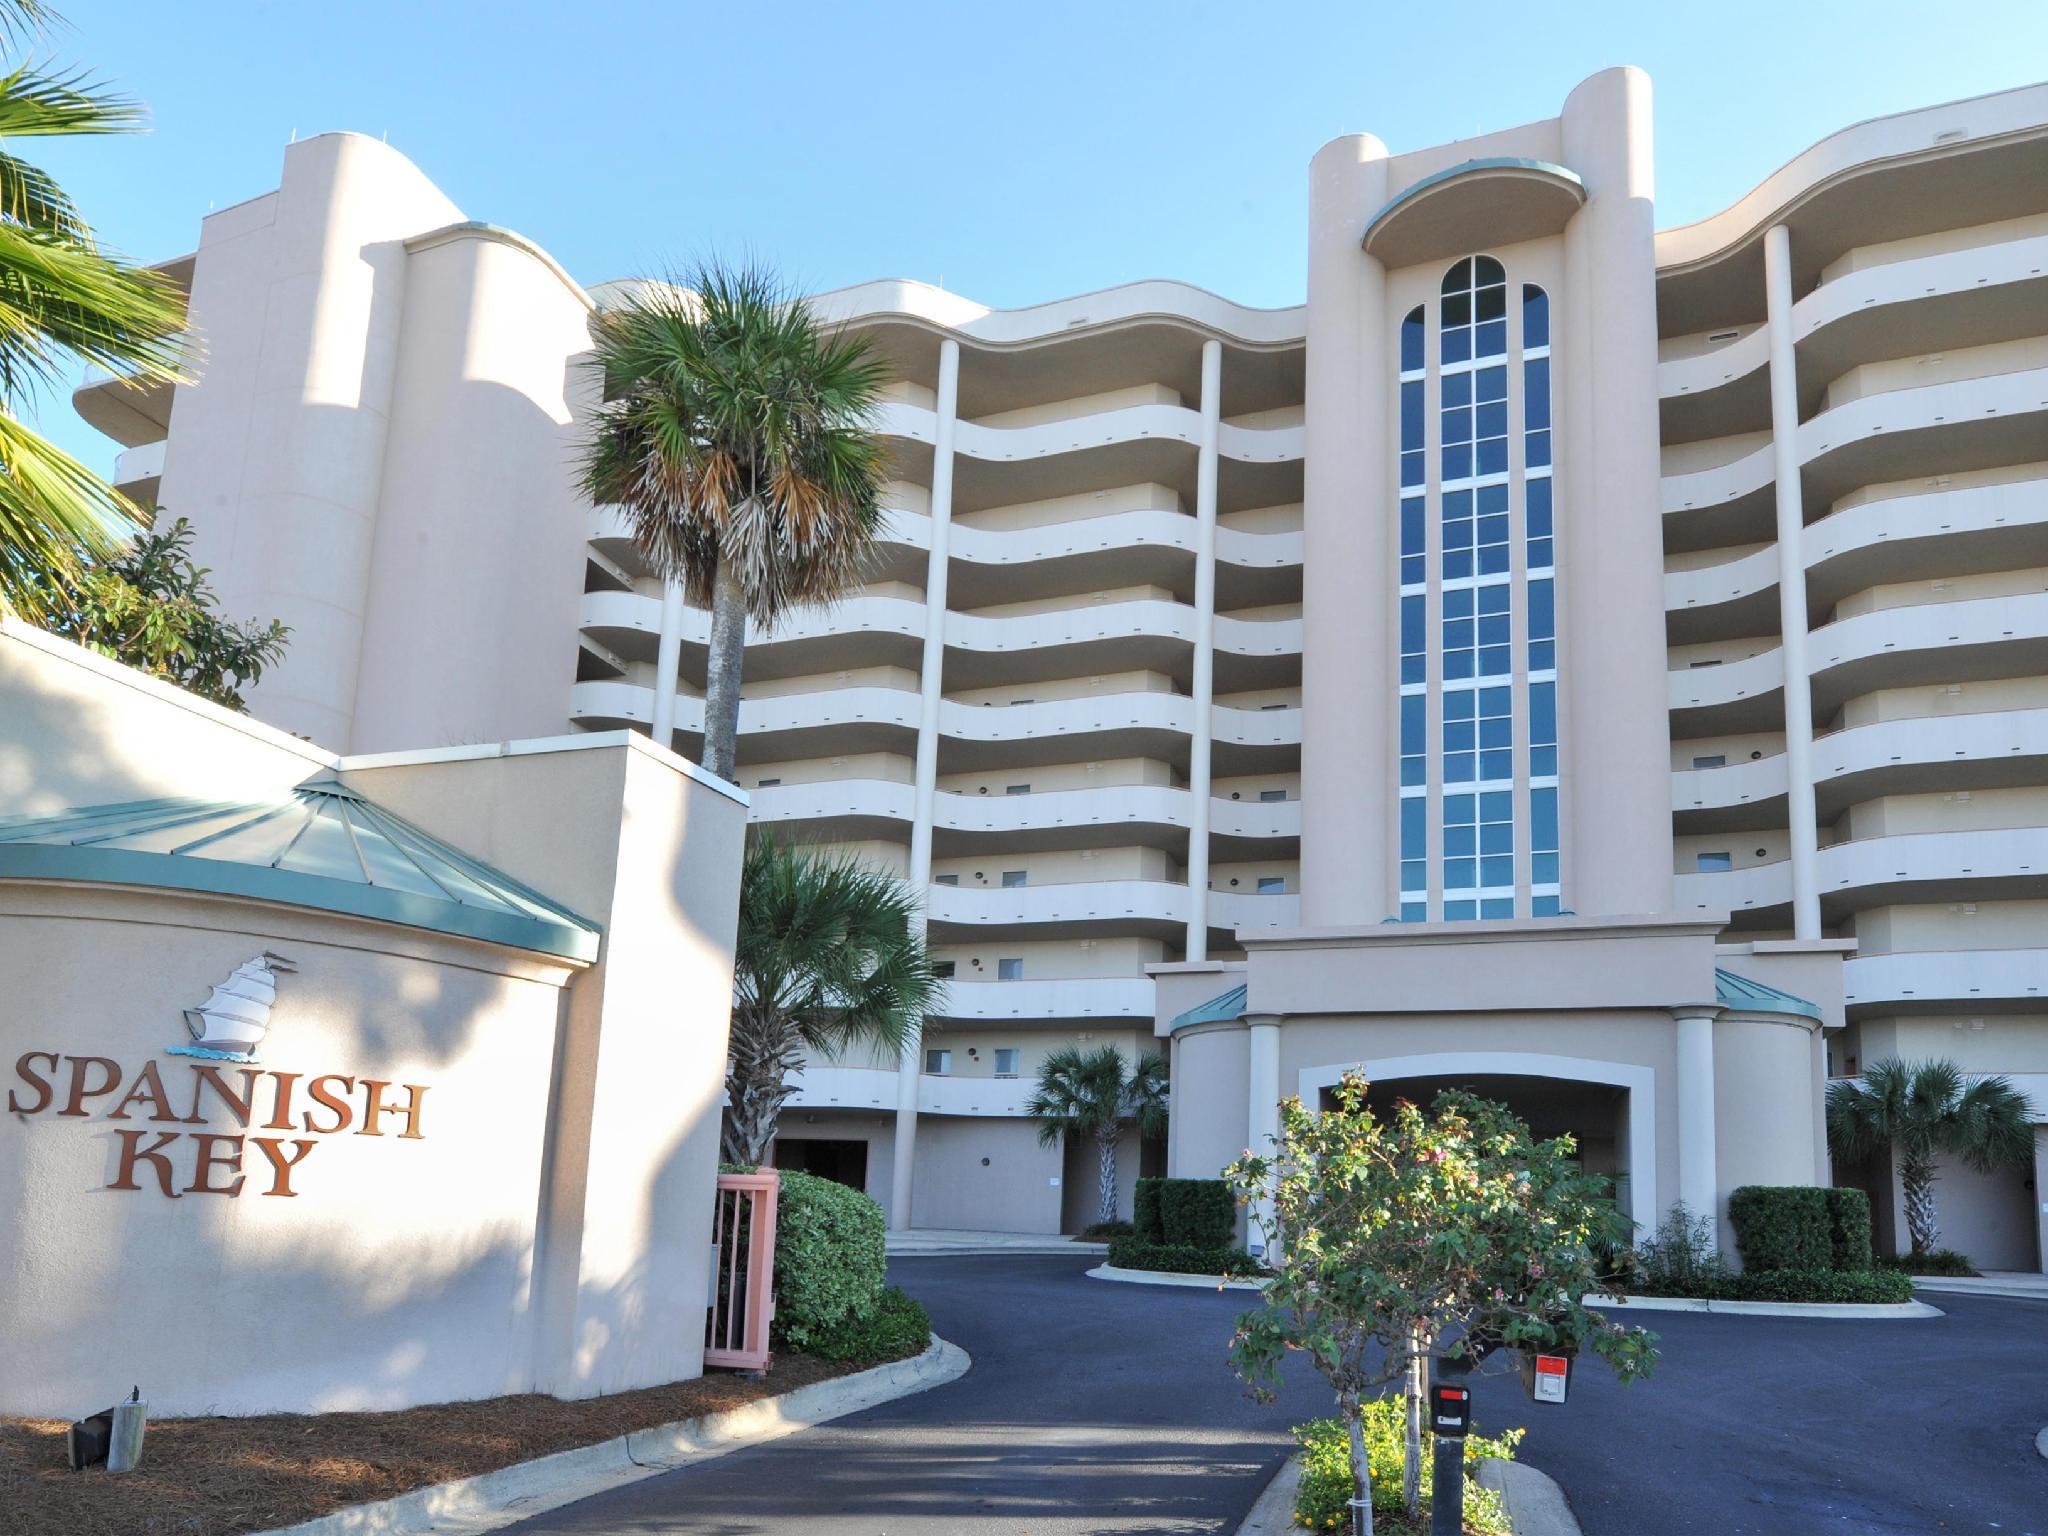 Spanish Key Condominiums By Wyndham Vacation Rentals